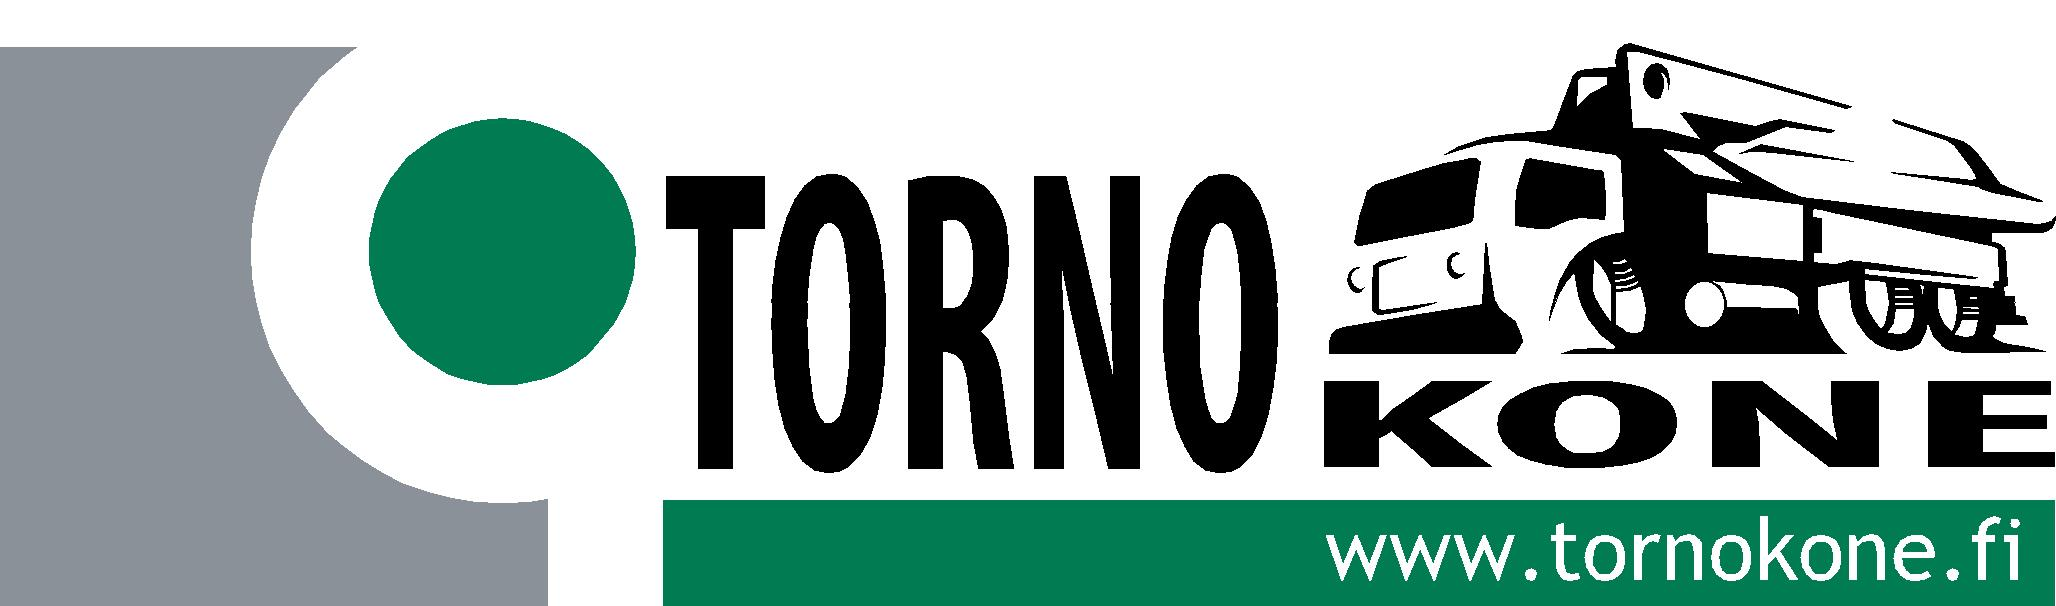 Tornokone